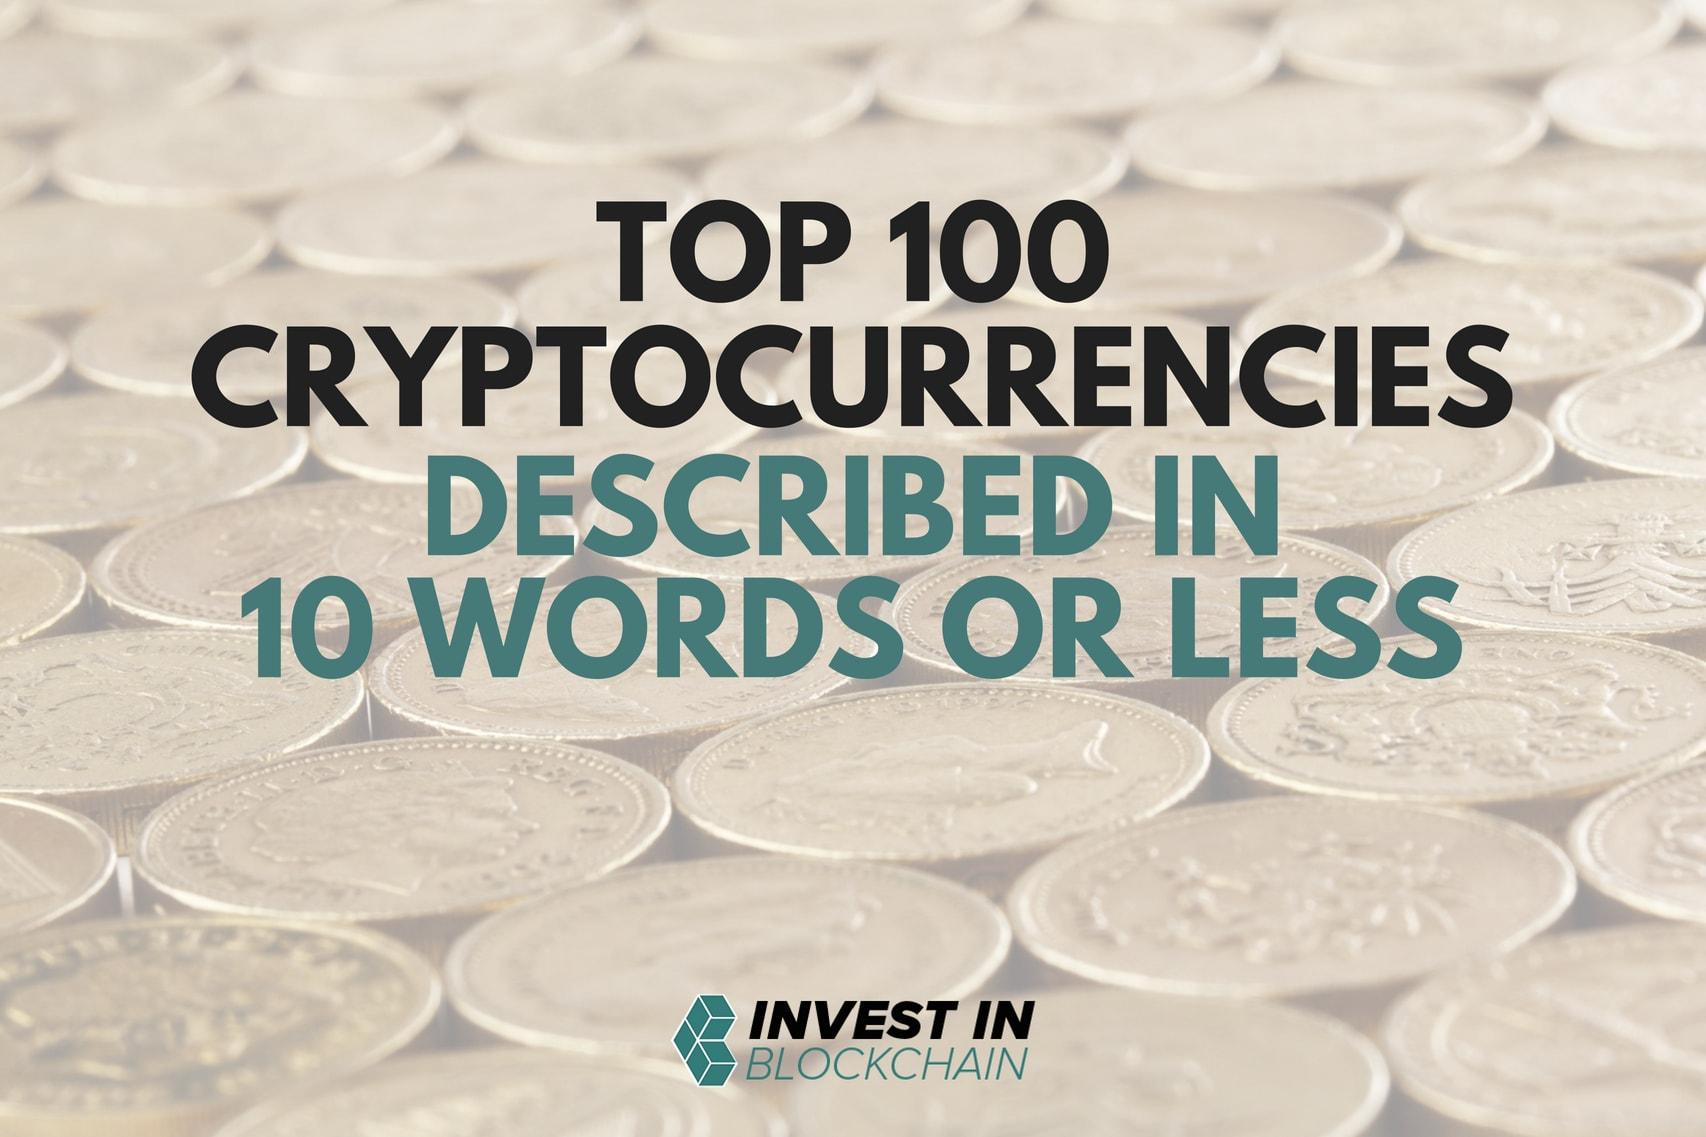 Top 100 Cryptocurrencies Described in 10 Words or Less